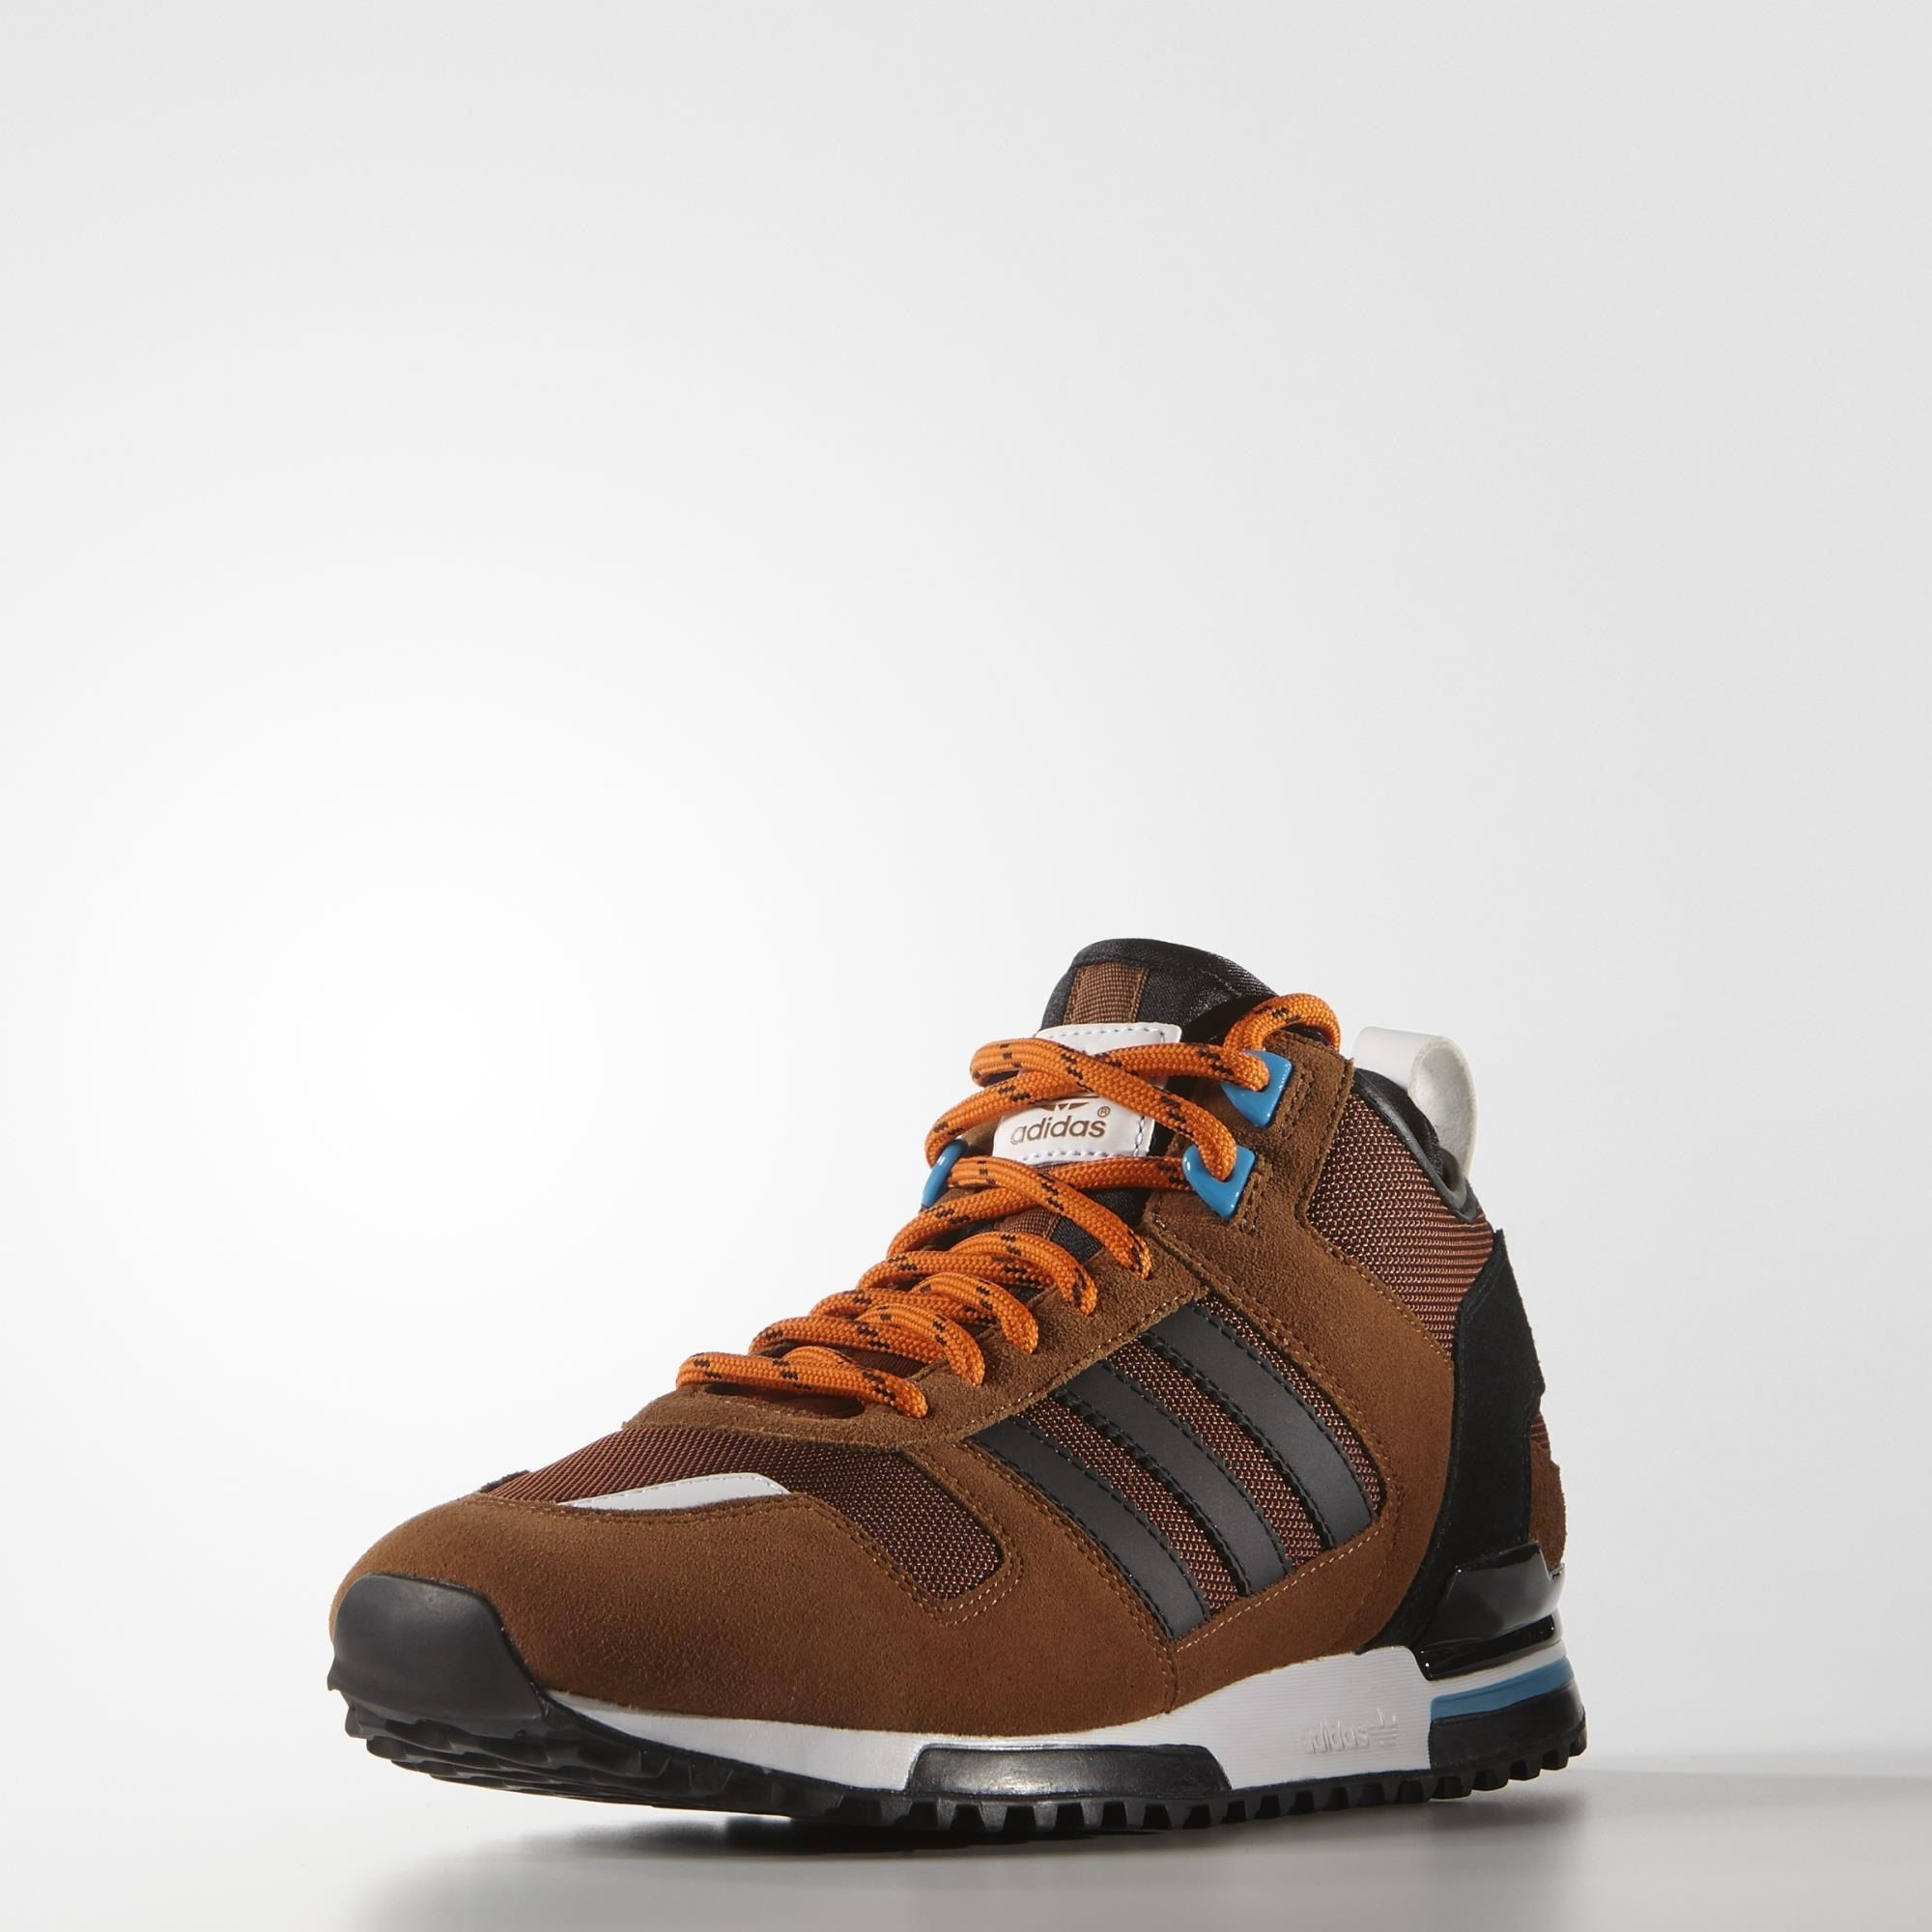 8e181584b80be ... france 100 waterproof adidas zx 700 winter climaproof shoes green adidas  us 27b95 77636